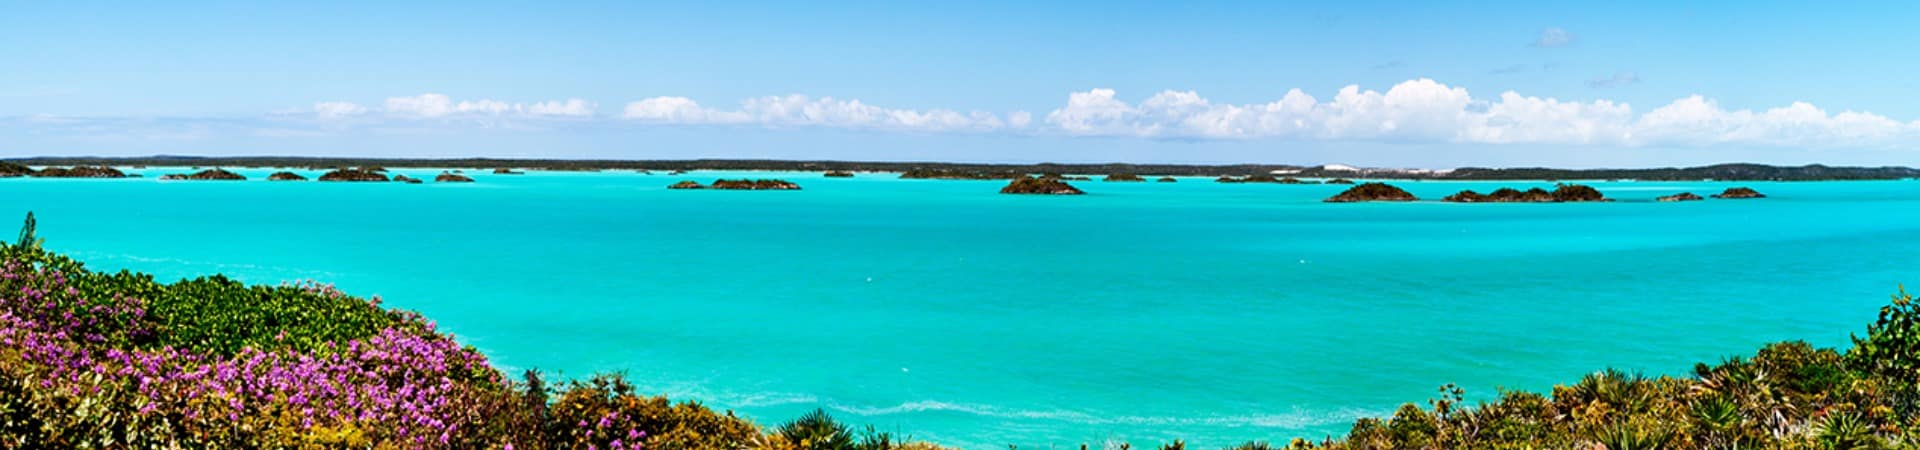 Lagoa azul, Parque Nacional Chalk Sound, Providenciales, Turks and Caicos